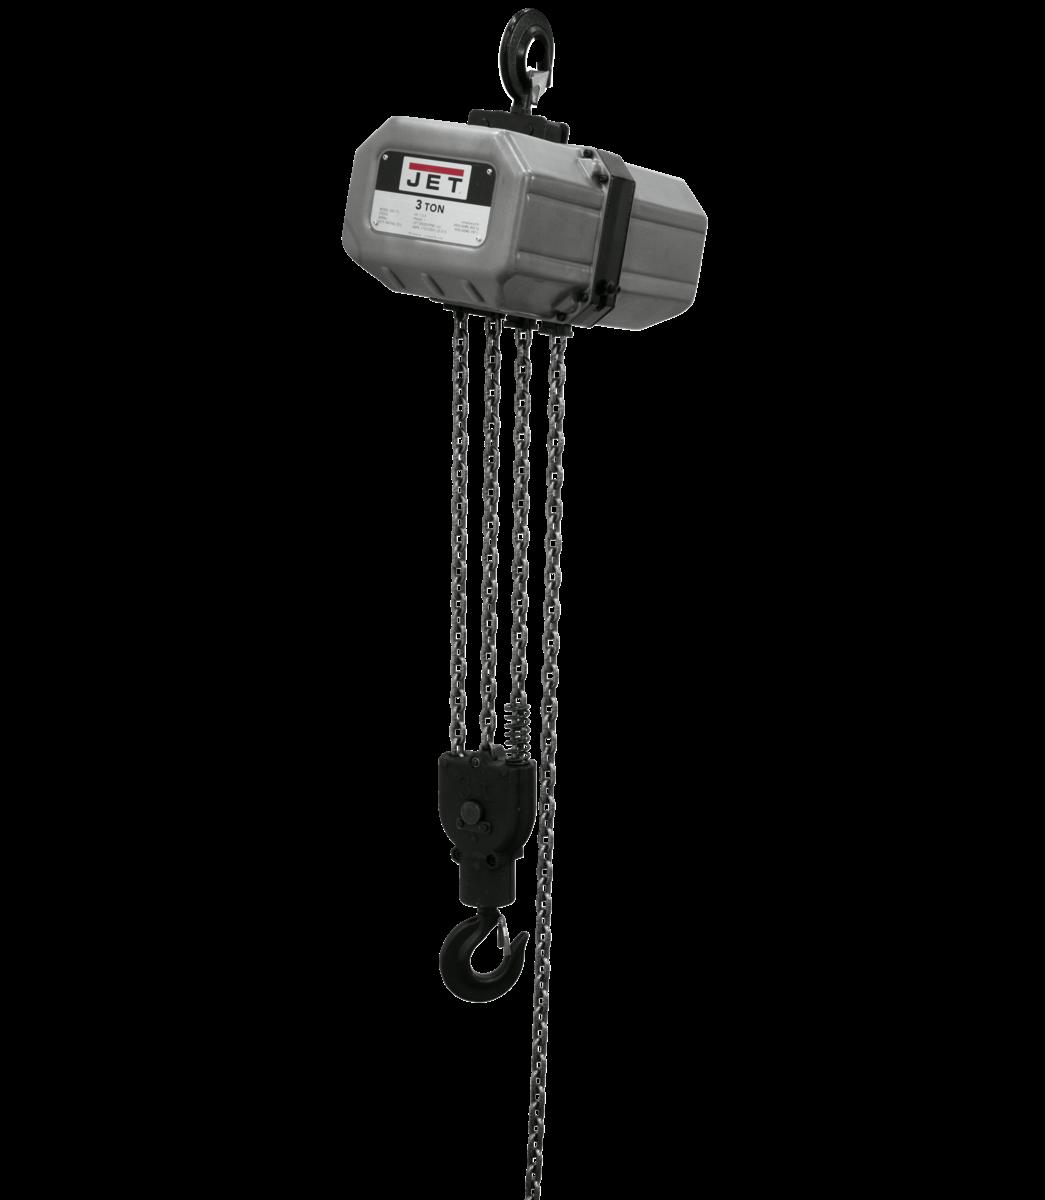 3SS-1C-10, 3-Ton Electric Chain Hoist 1-Phase 10' Lift